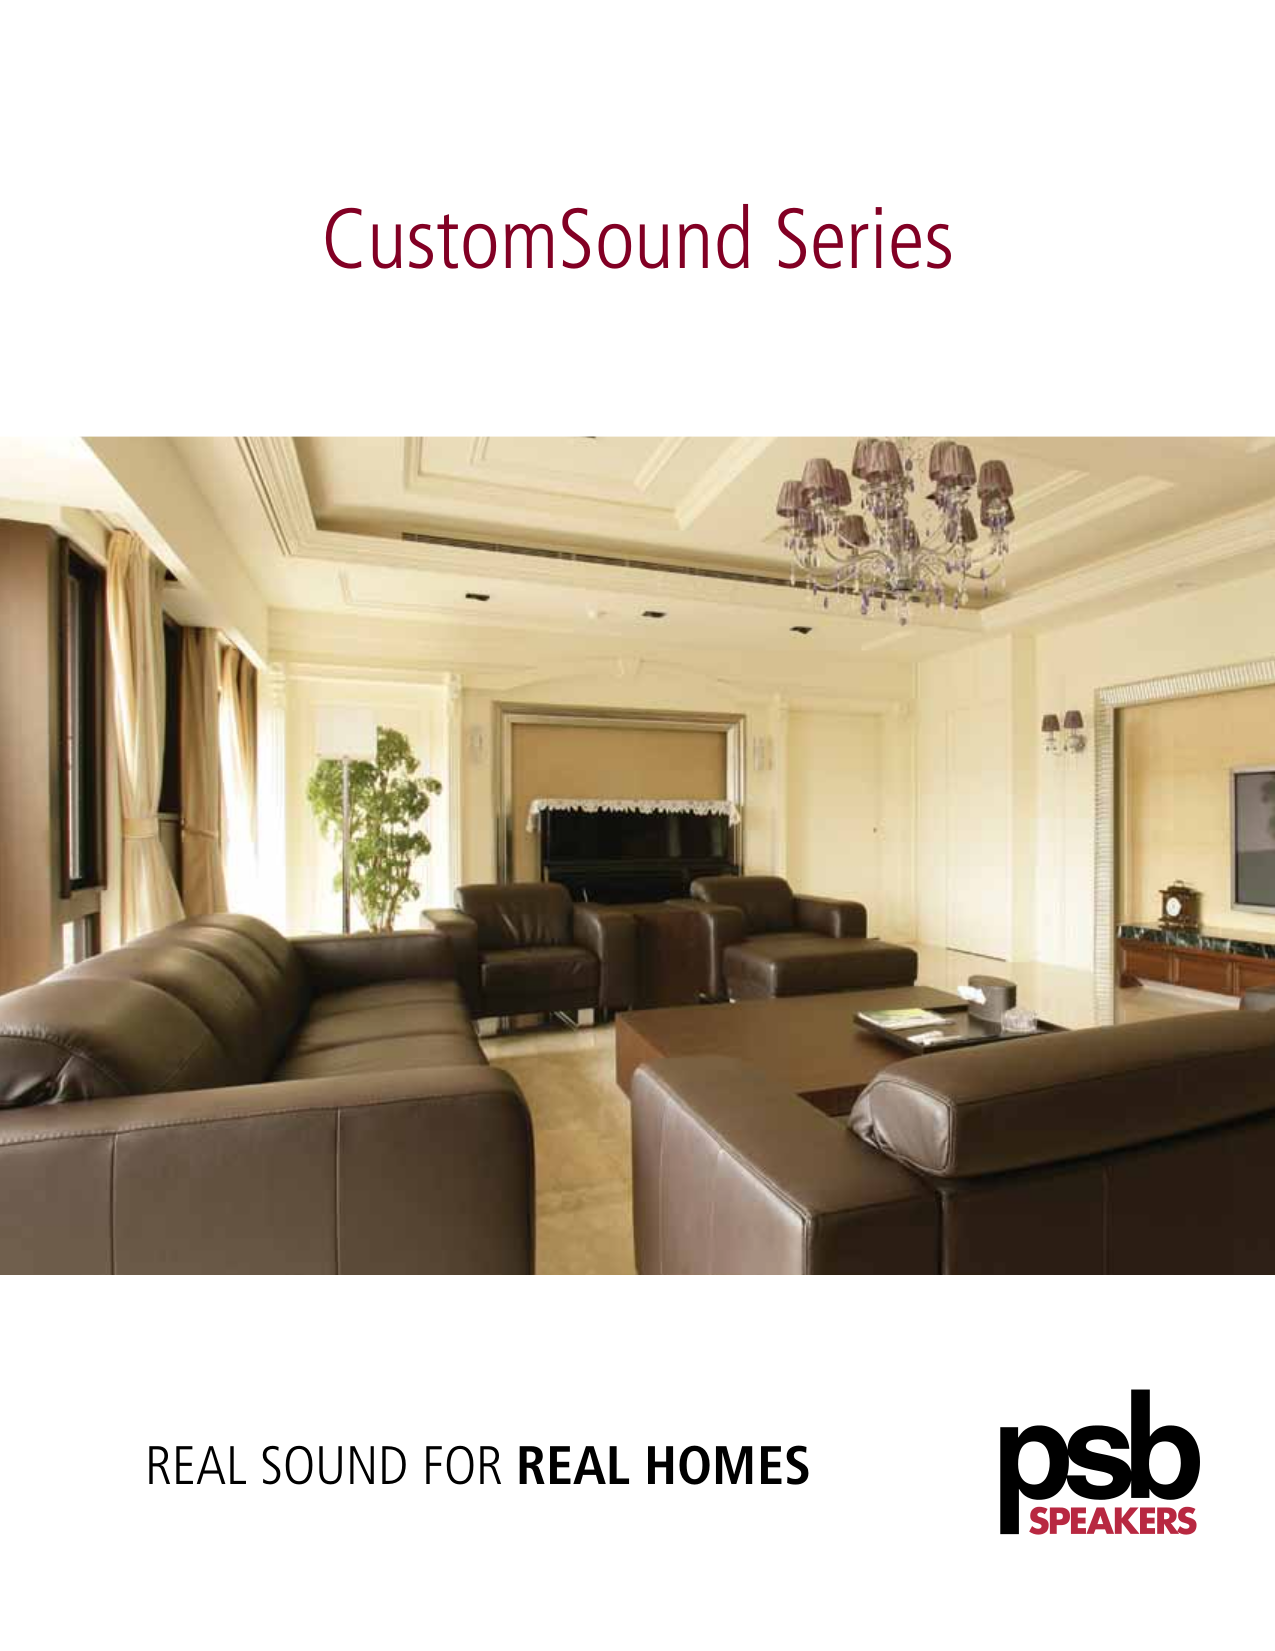 pdf for PSB Speaker System CustomSound CW160S manual